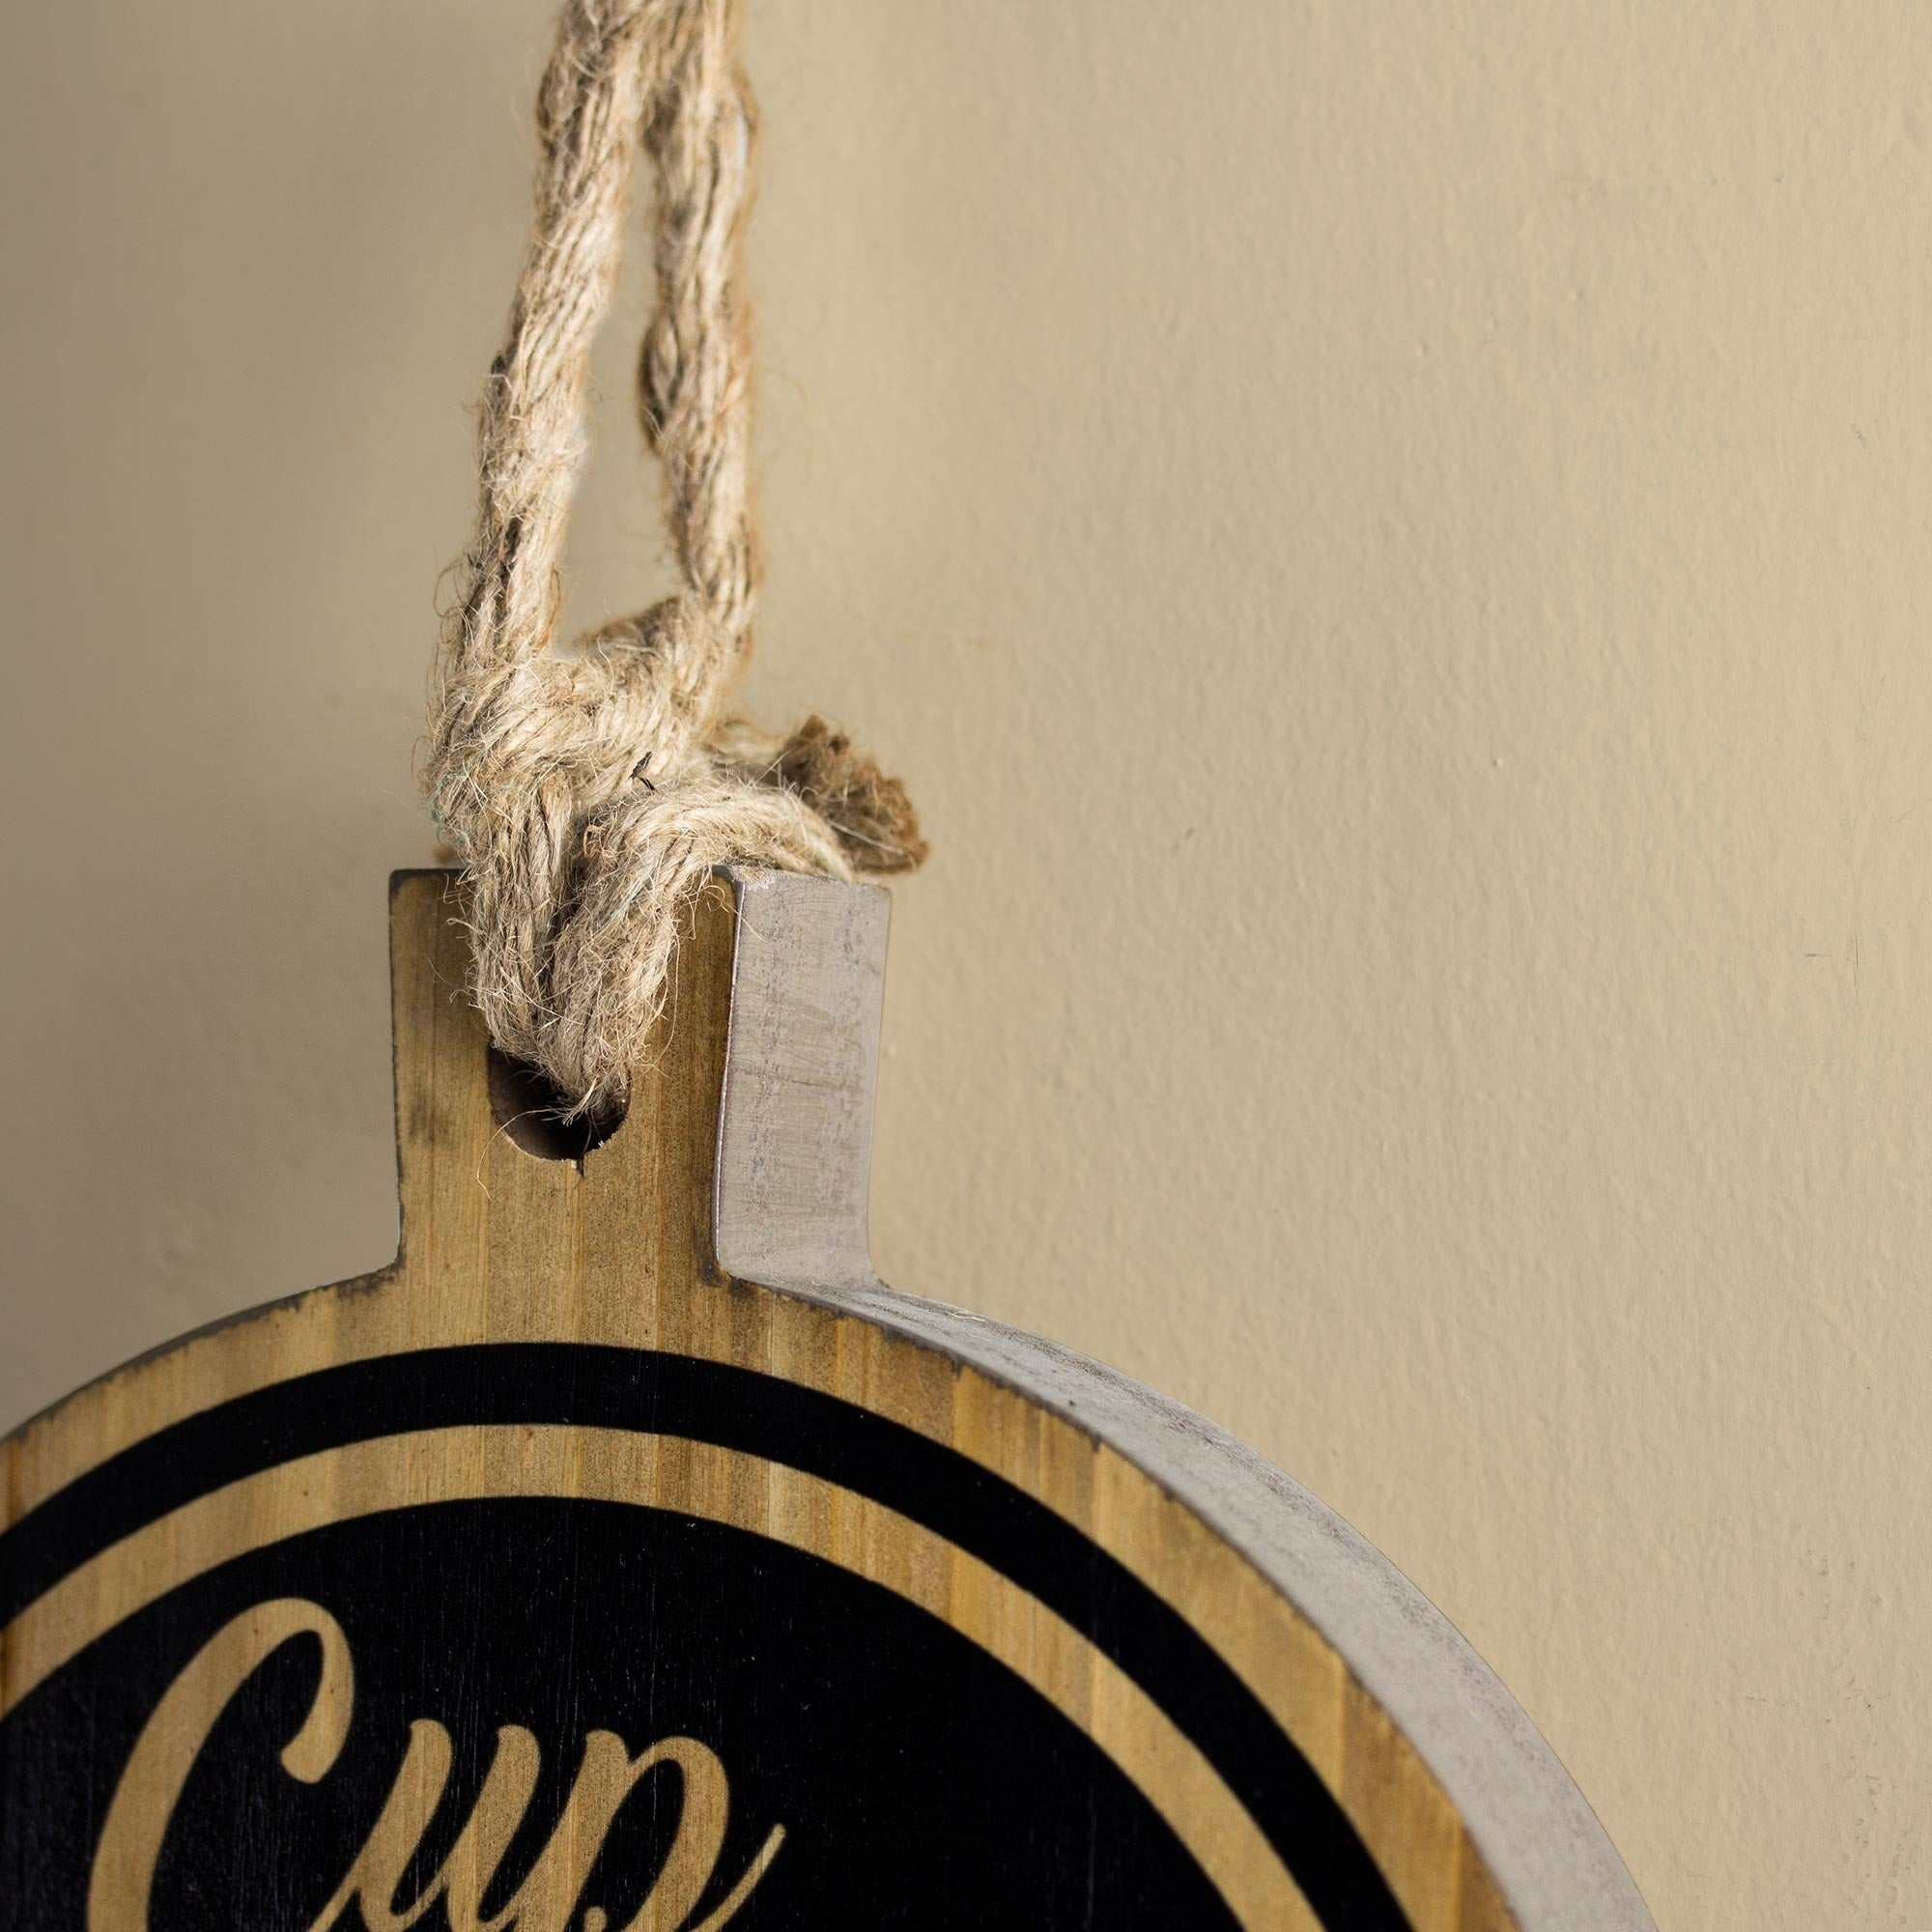 Shop American Art Decor Cup Of Joe Wood Coffee Wall Decor – Free In 2019 Cup Of Joe Wall Decor (View 15 of 20)